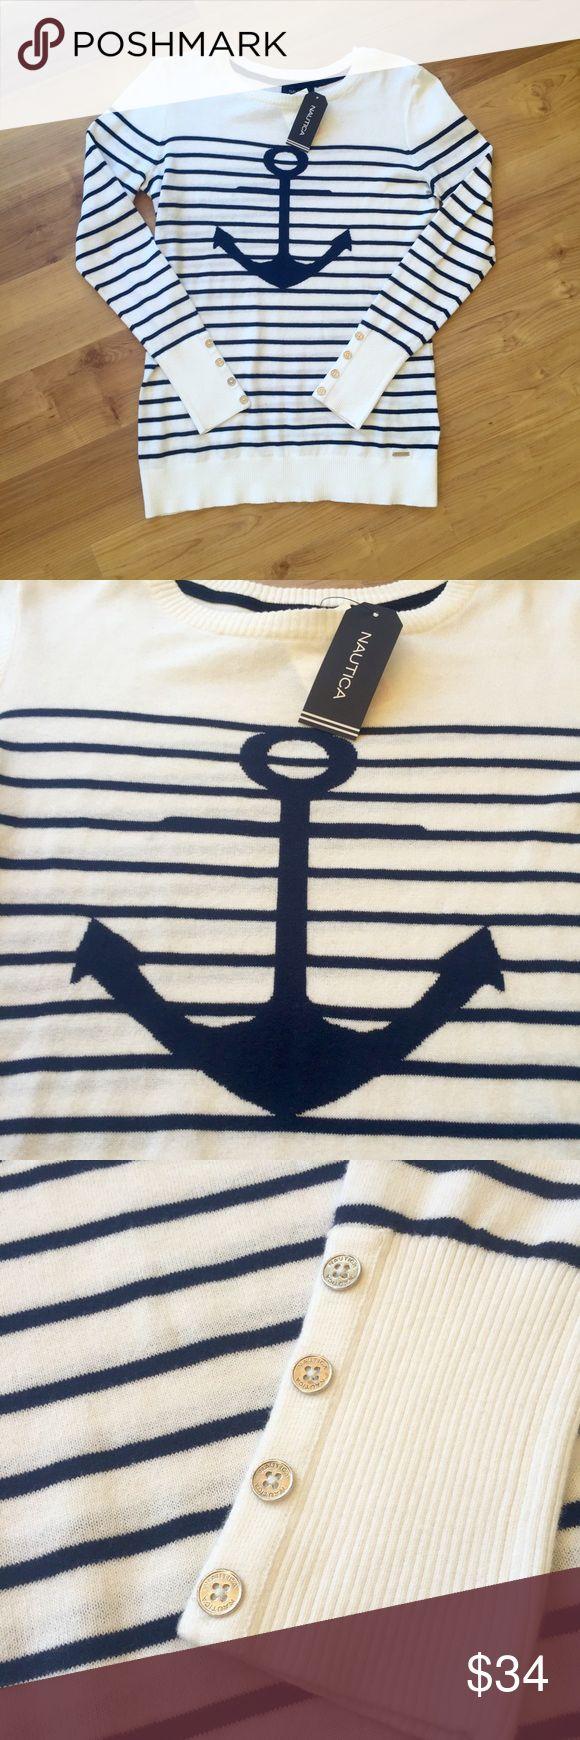 NWT Nautica Anchor Sweater NWT Nautica Sweater. Women's medium. 100% cotton. Sorry, no trades but open to offers! Nautica Sweaters Crew & Scoop Necks